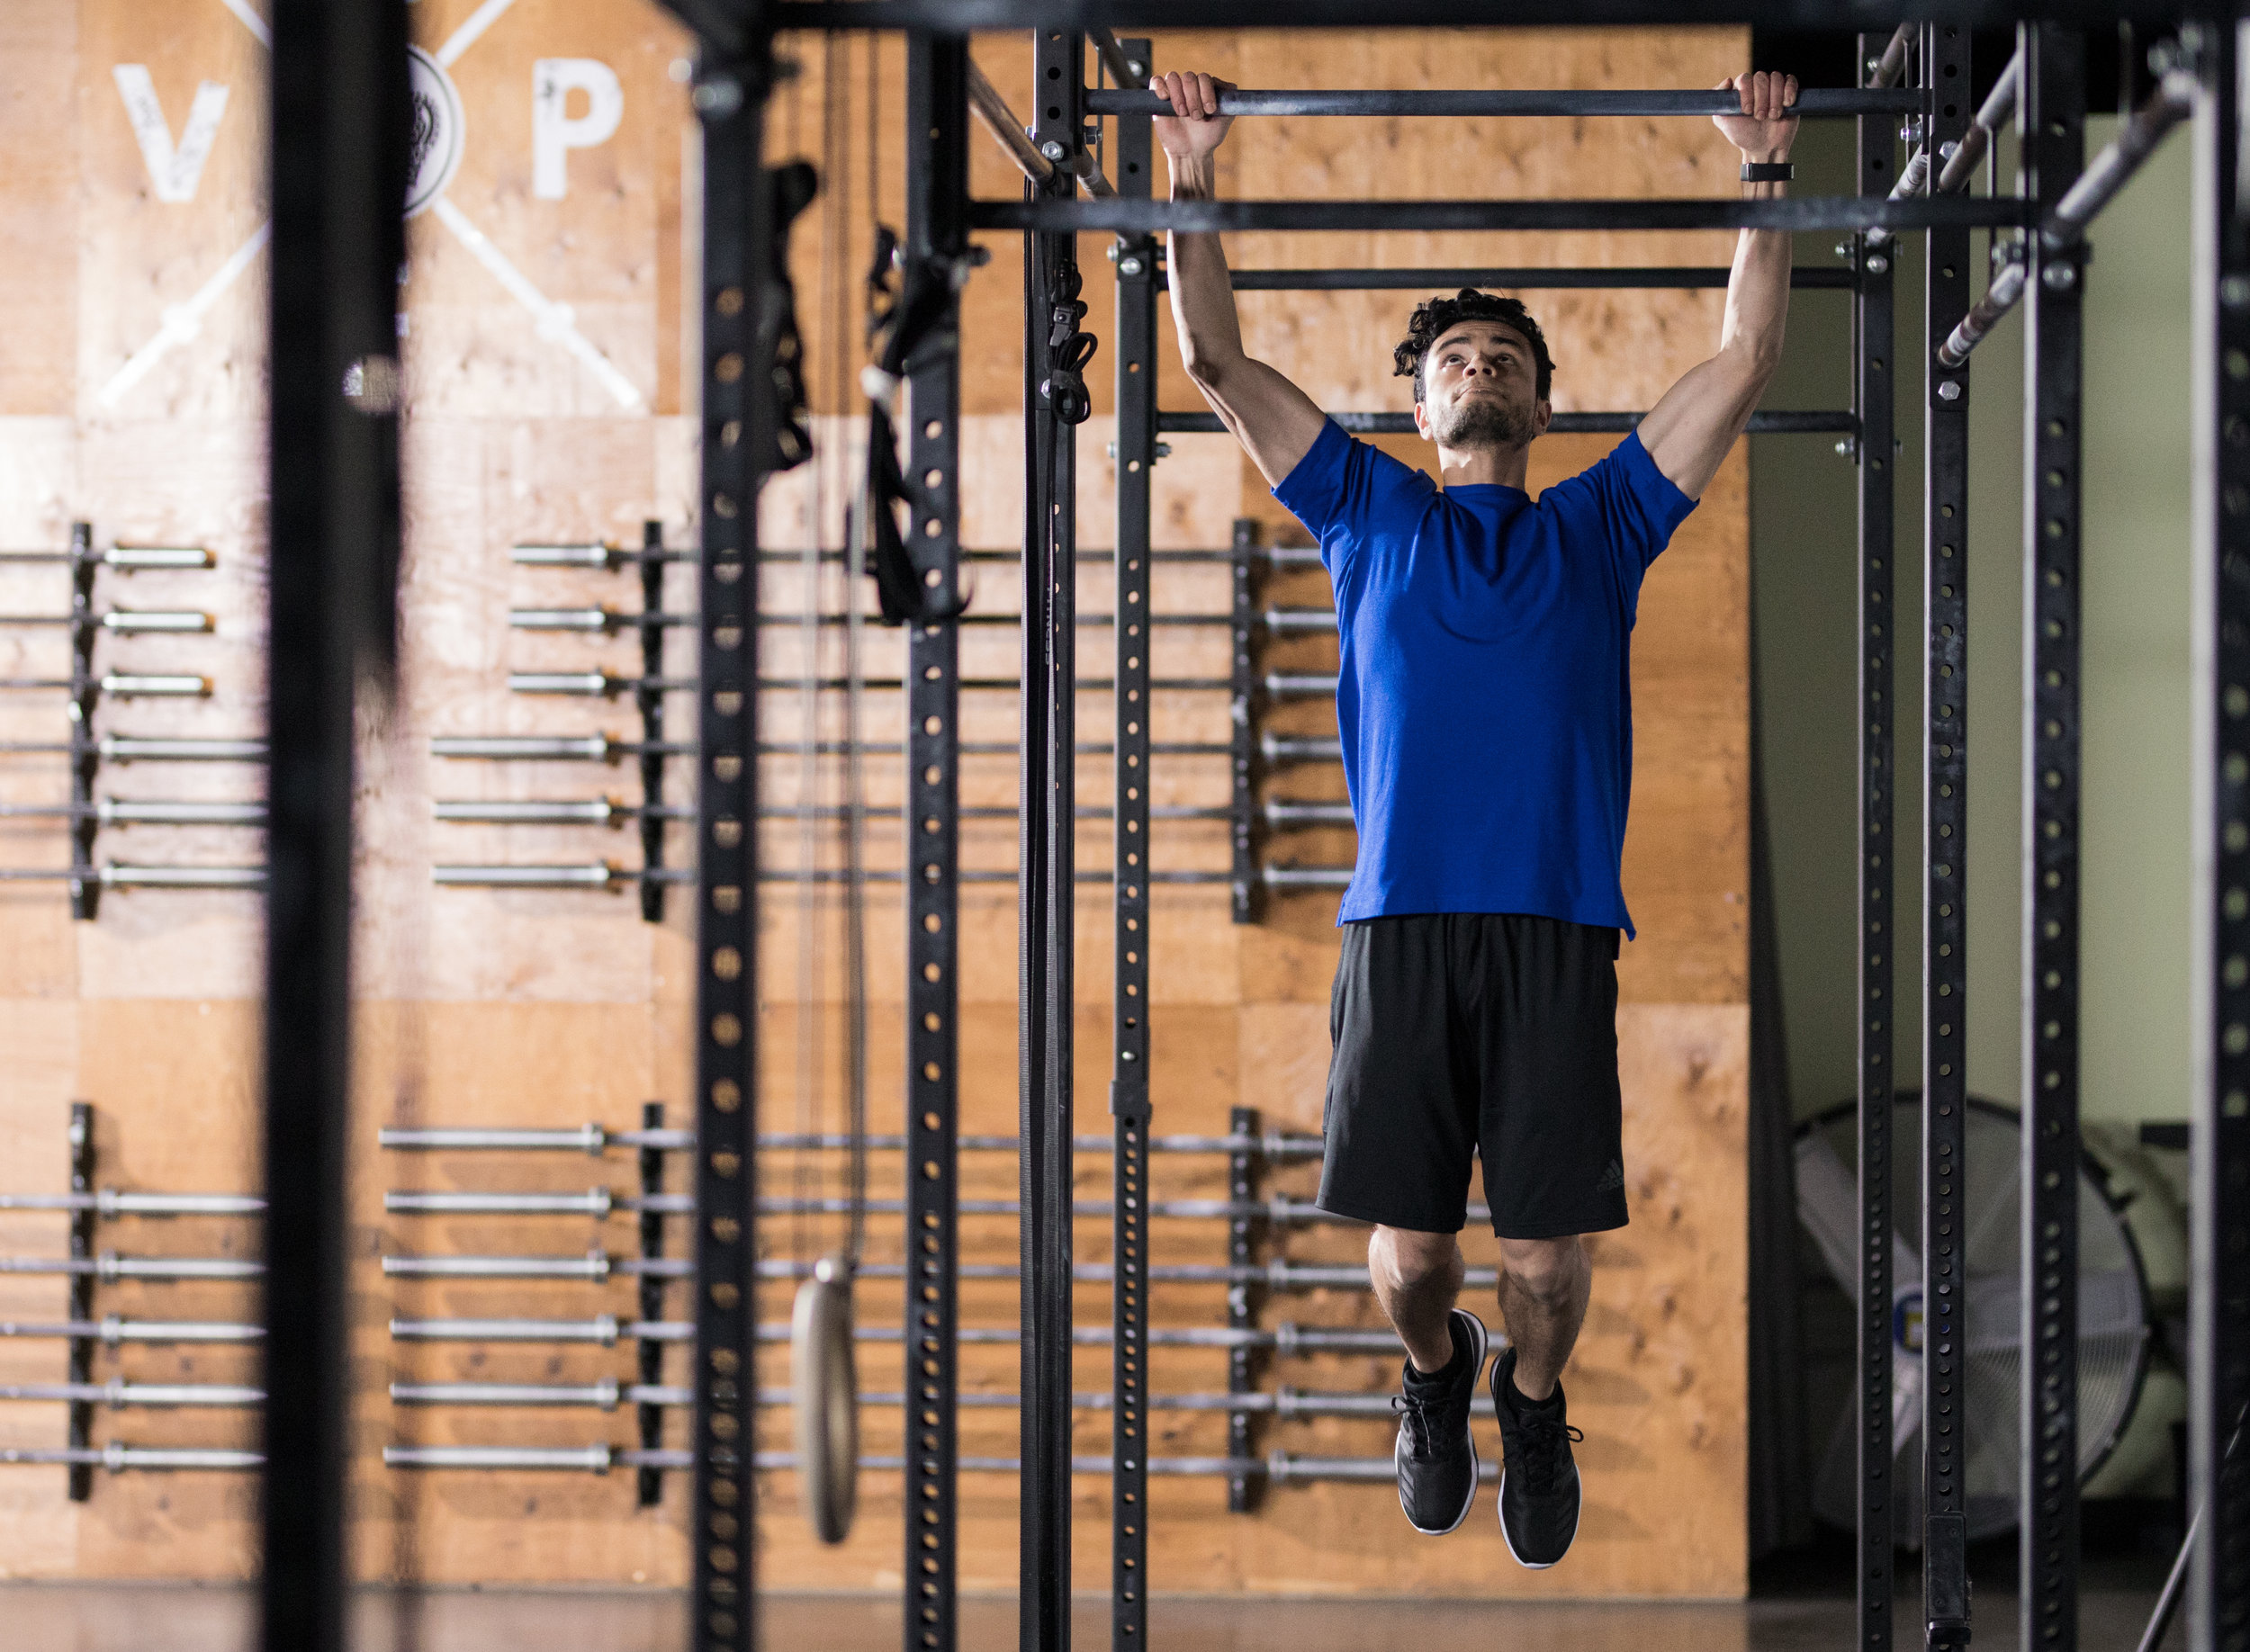 SC-Fitness-Crossfit-NF2_8011.jpg